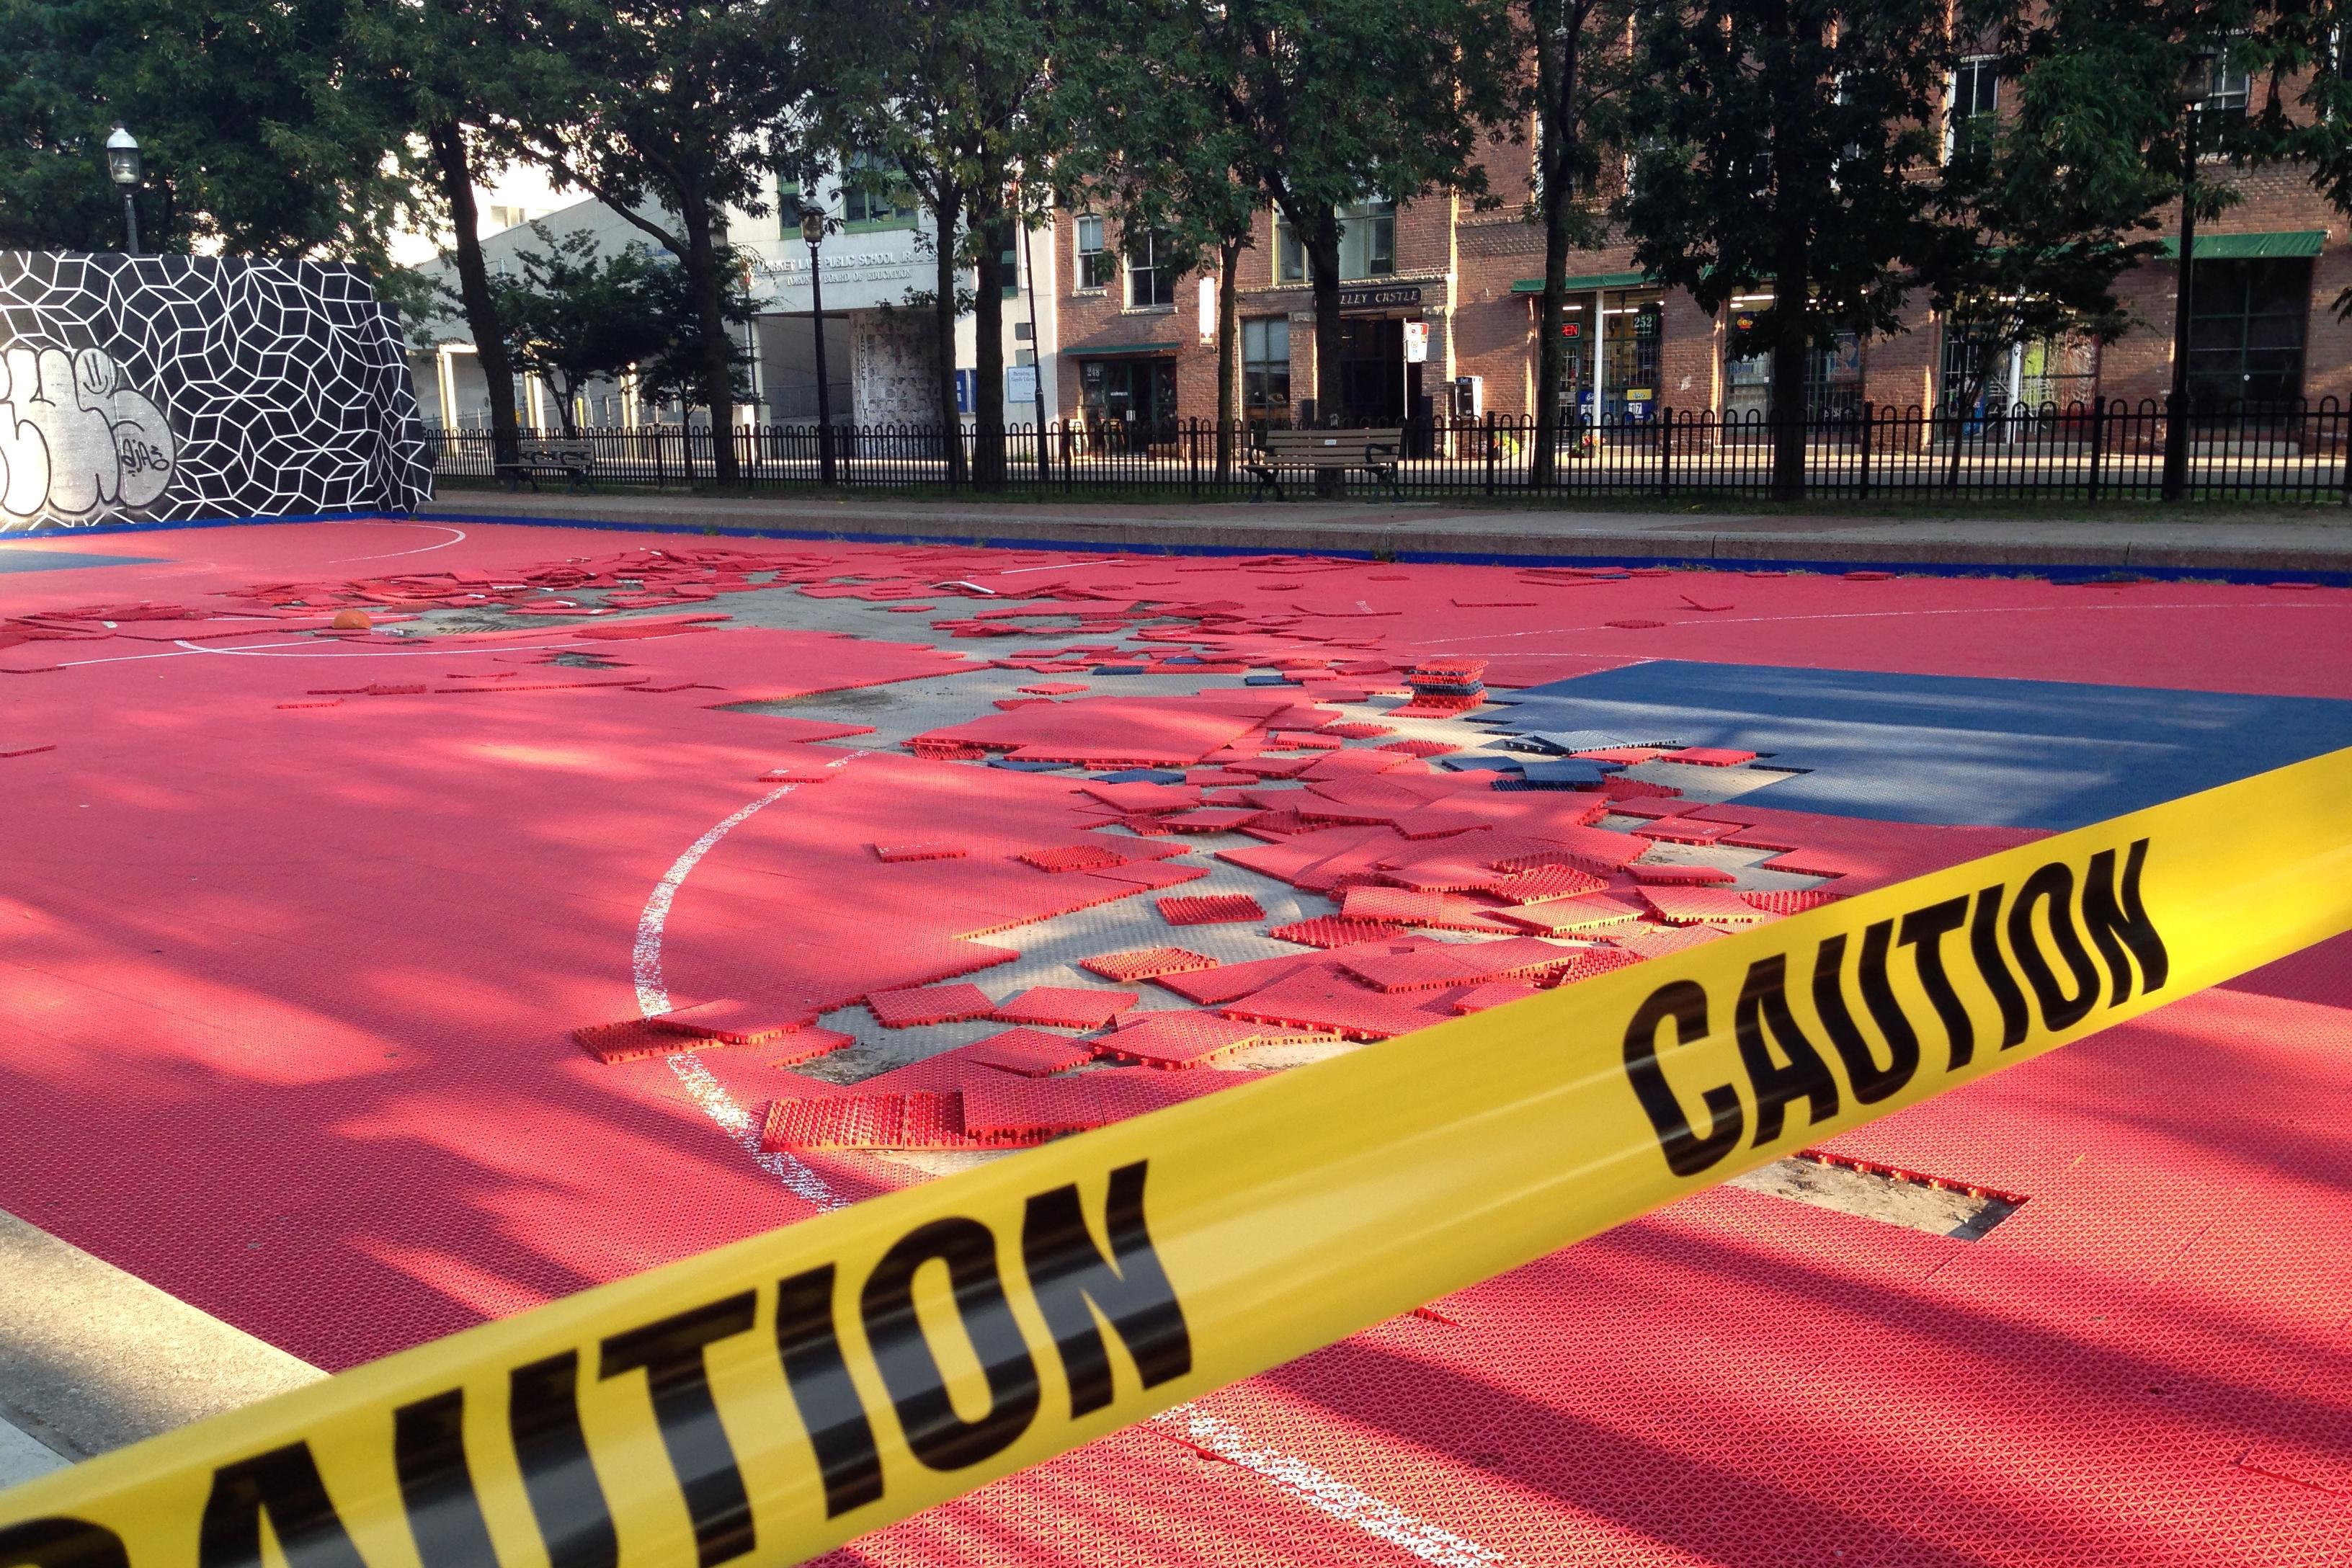 Police Mlse Help Repair David Crombie Basketball Court Citynews